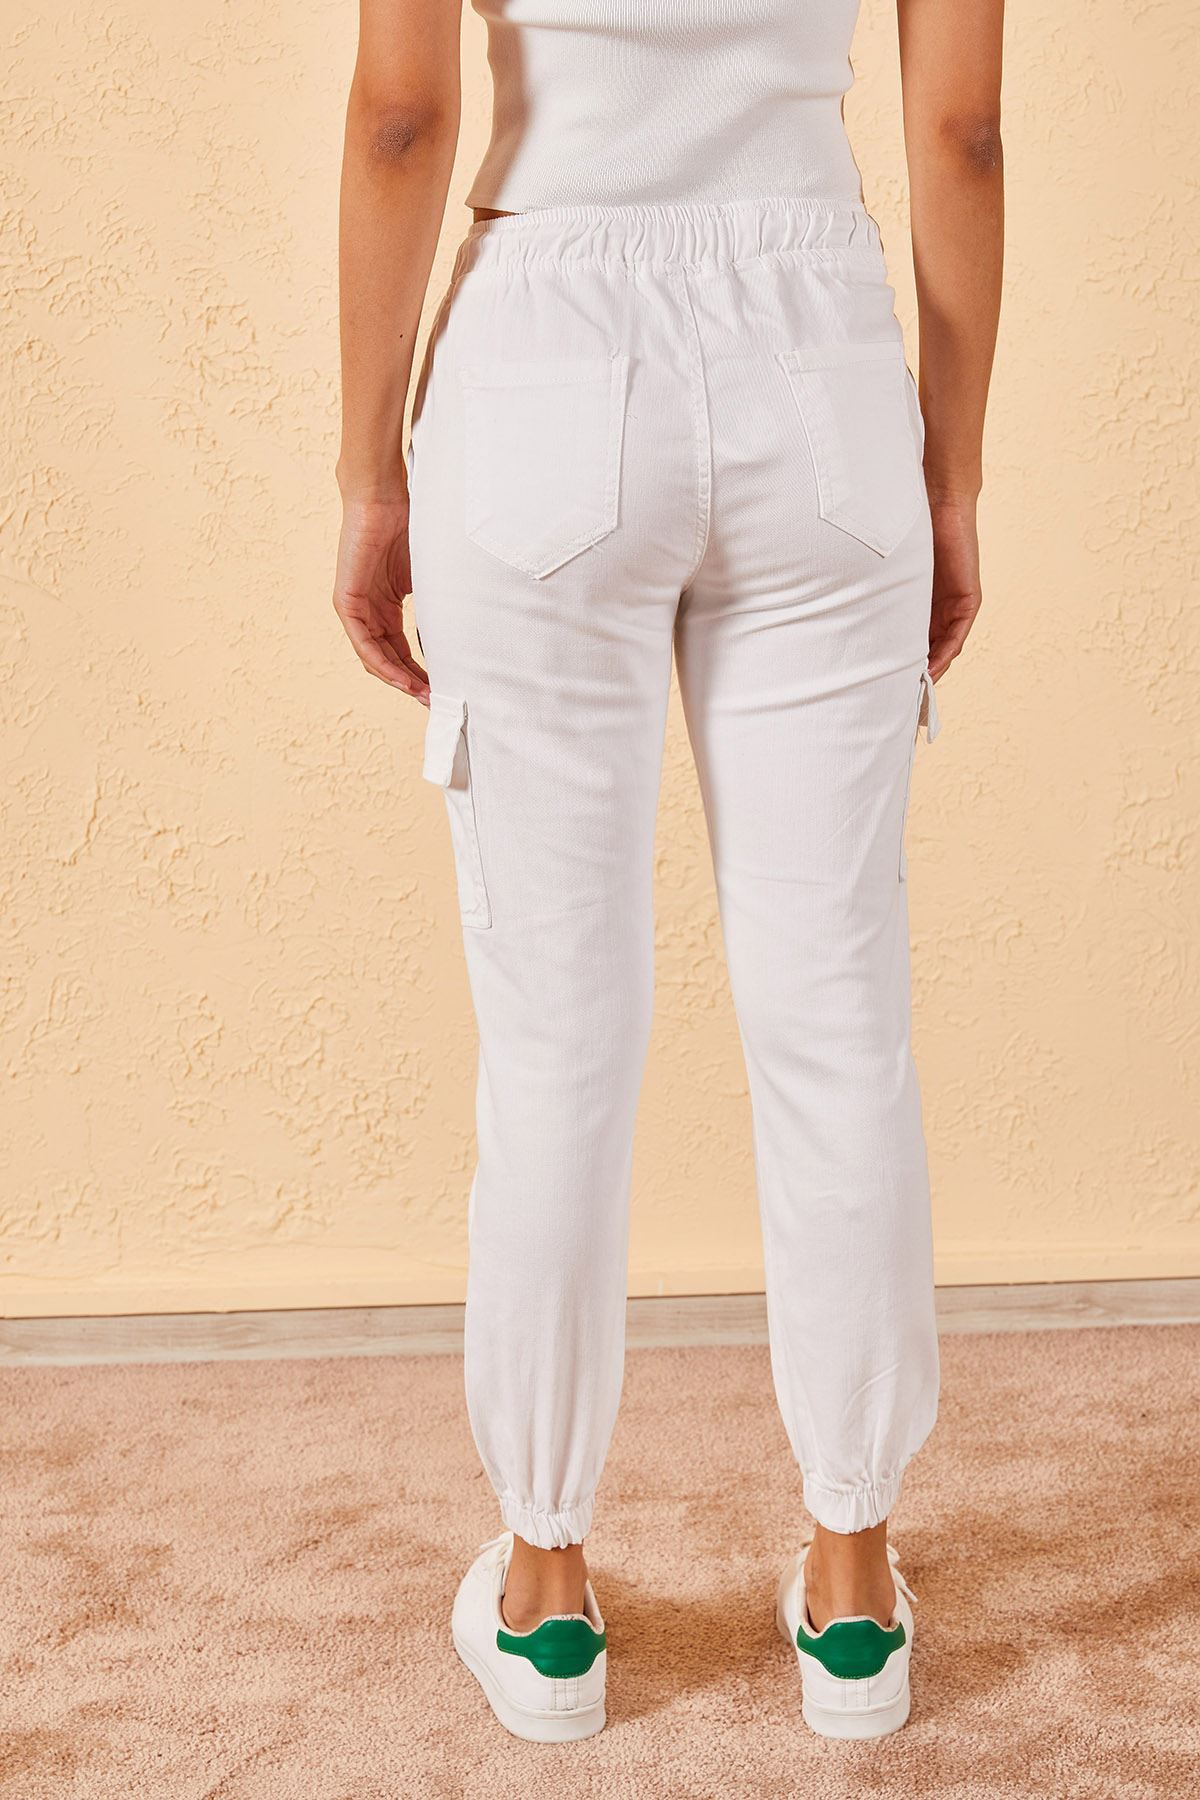 Kadın Lastikli Kargo Pantolon